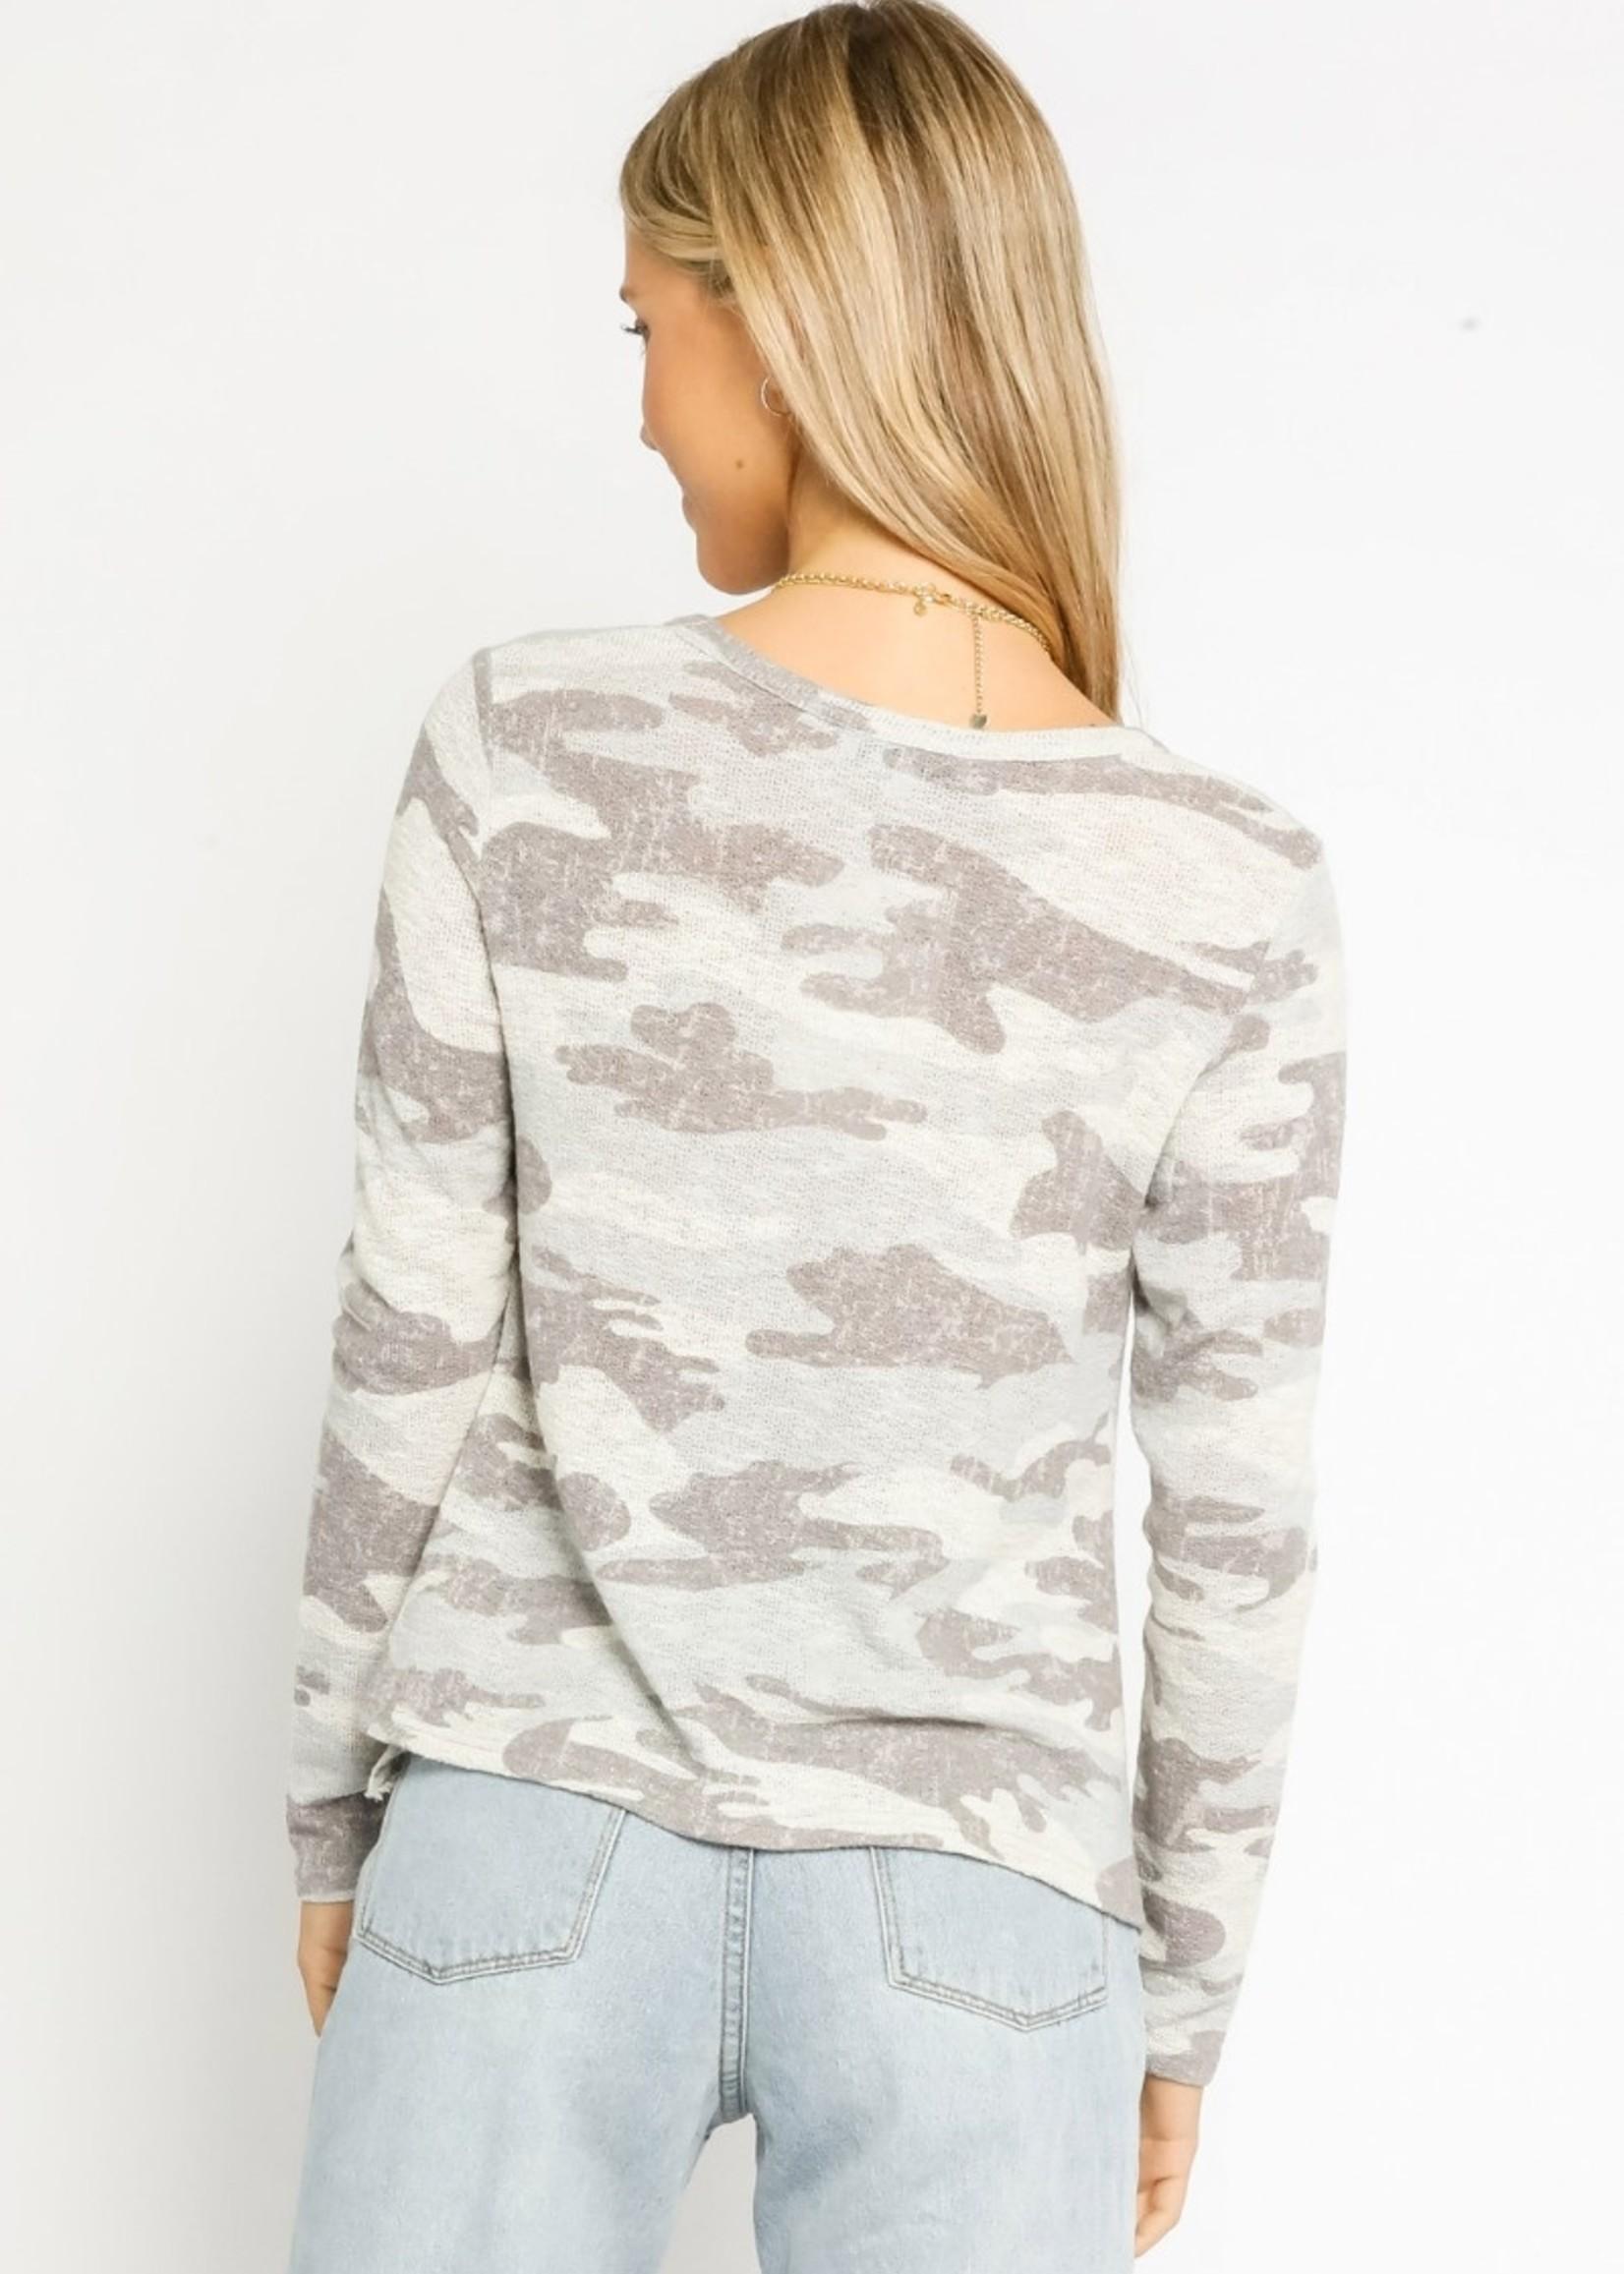 Light Camo Sweater